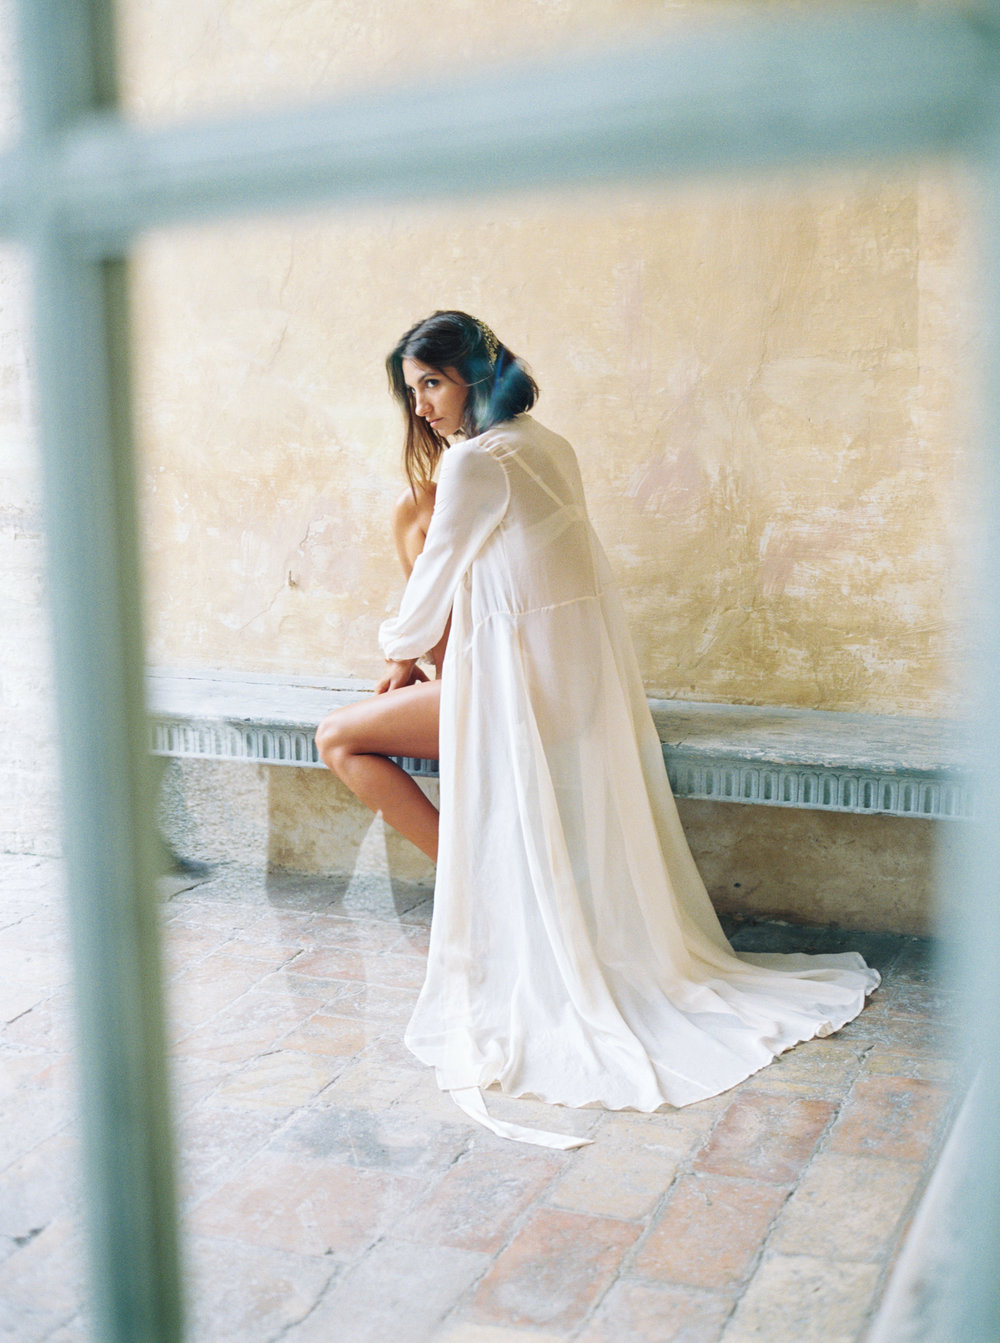 Italy-Adriana-Boudouir-28.jpg